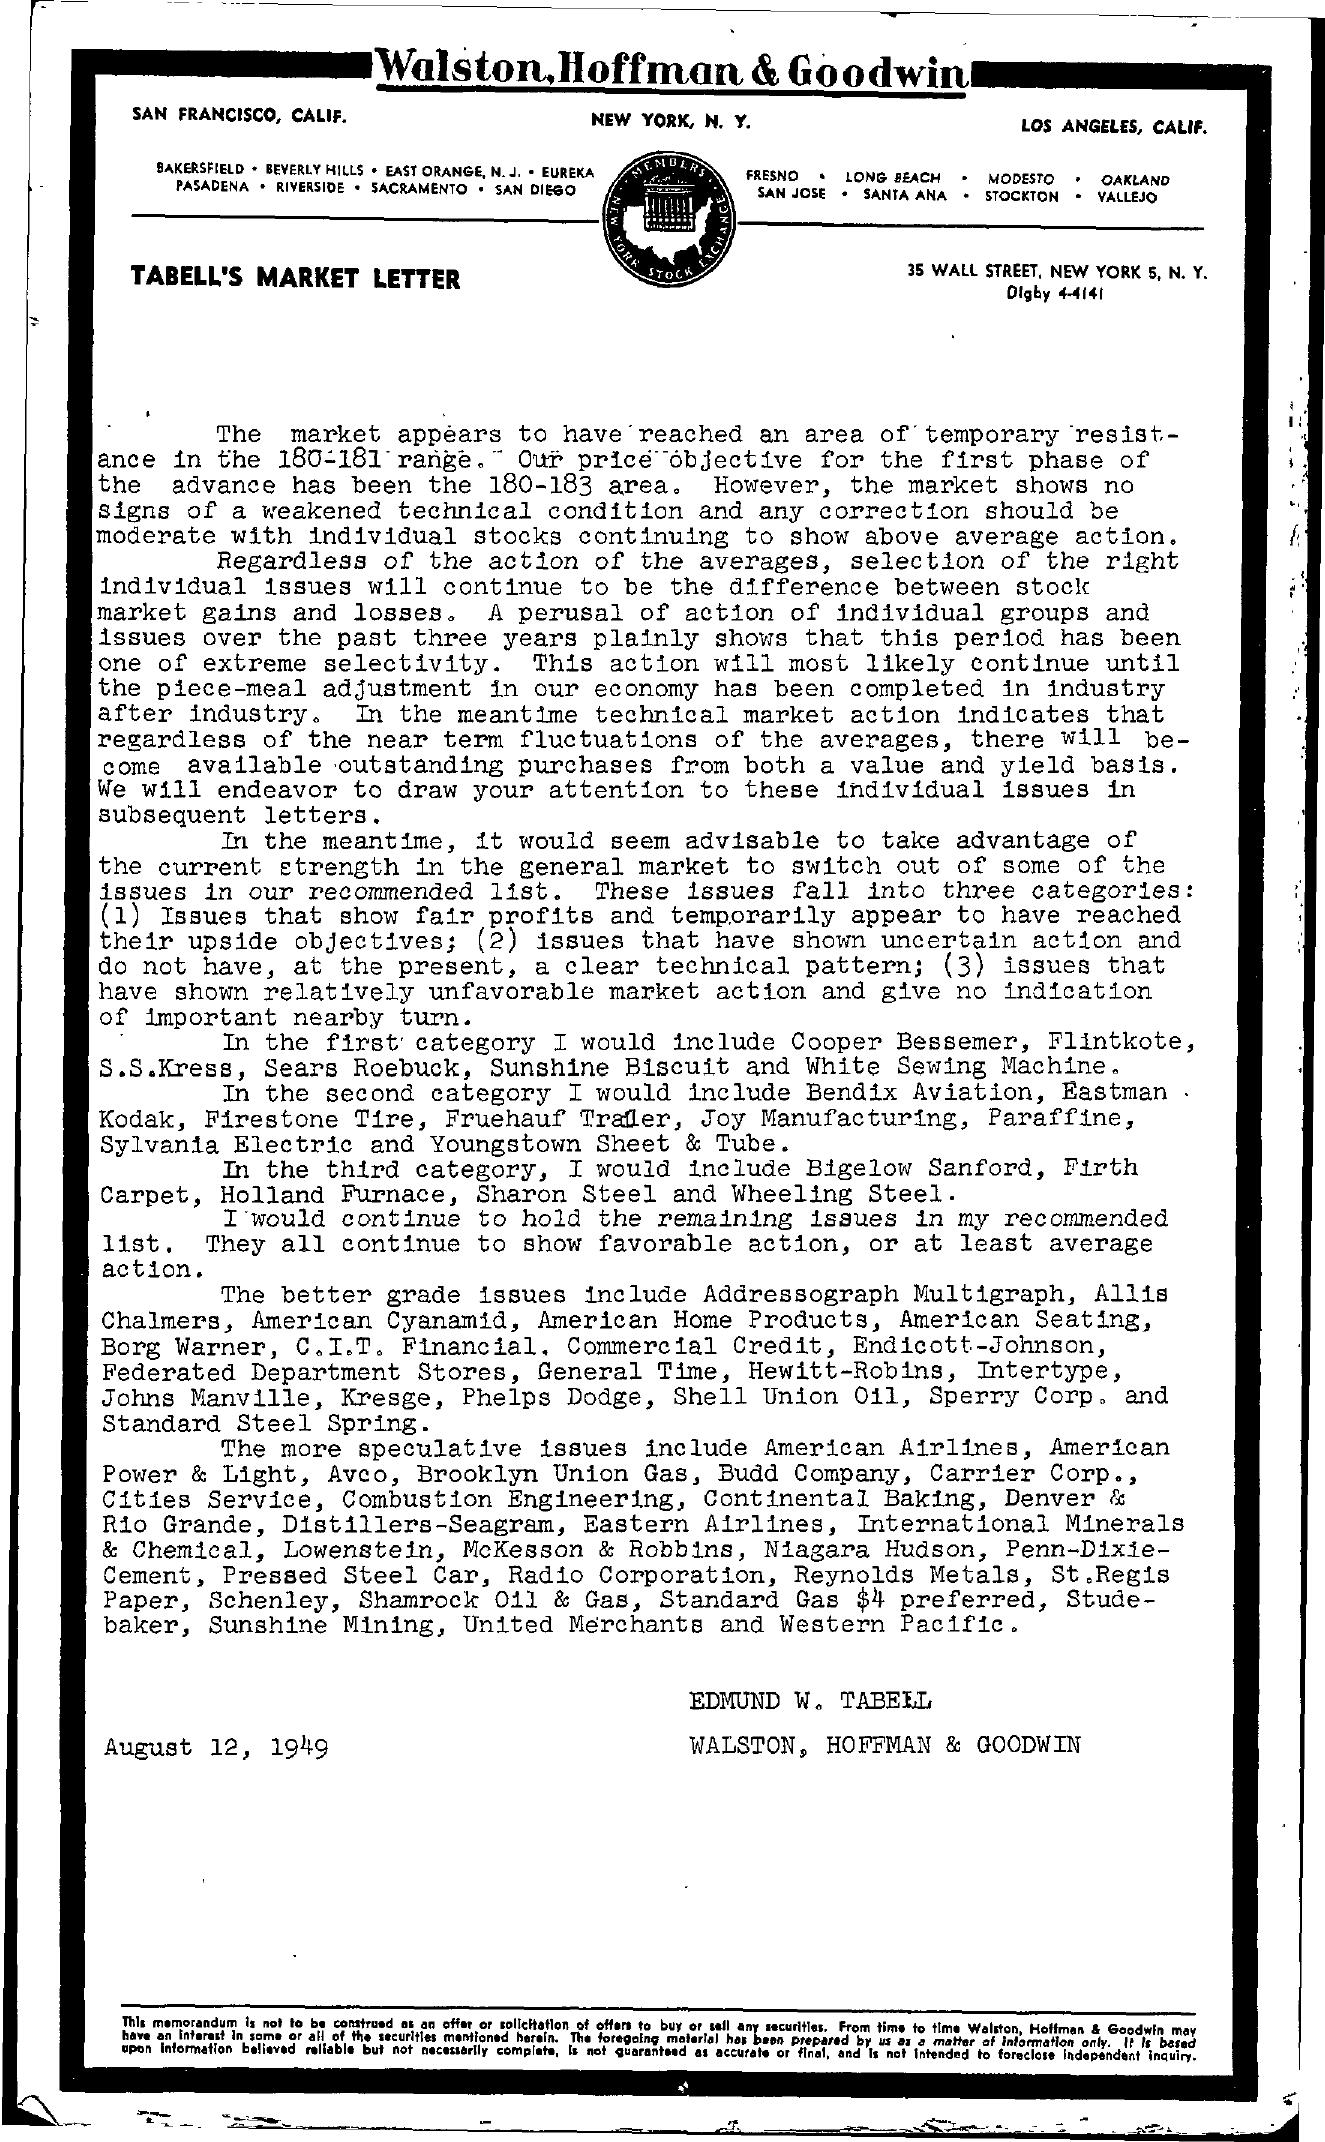 Tabell's Market Letter - August 12, 1949